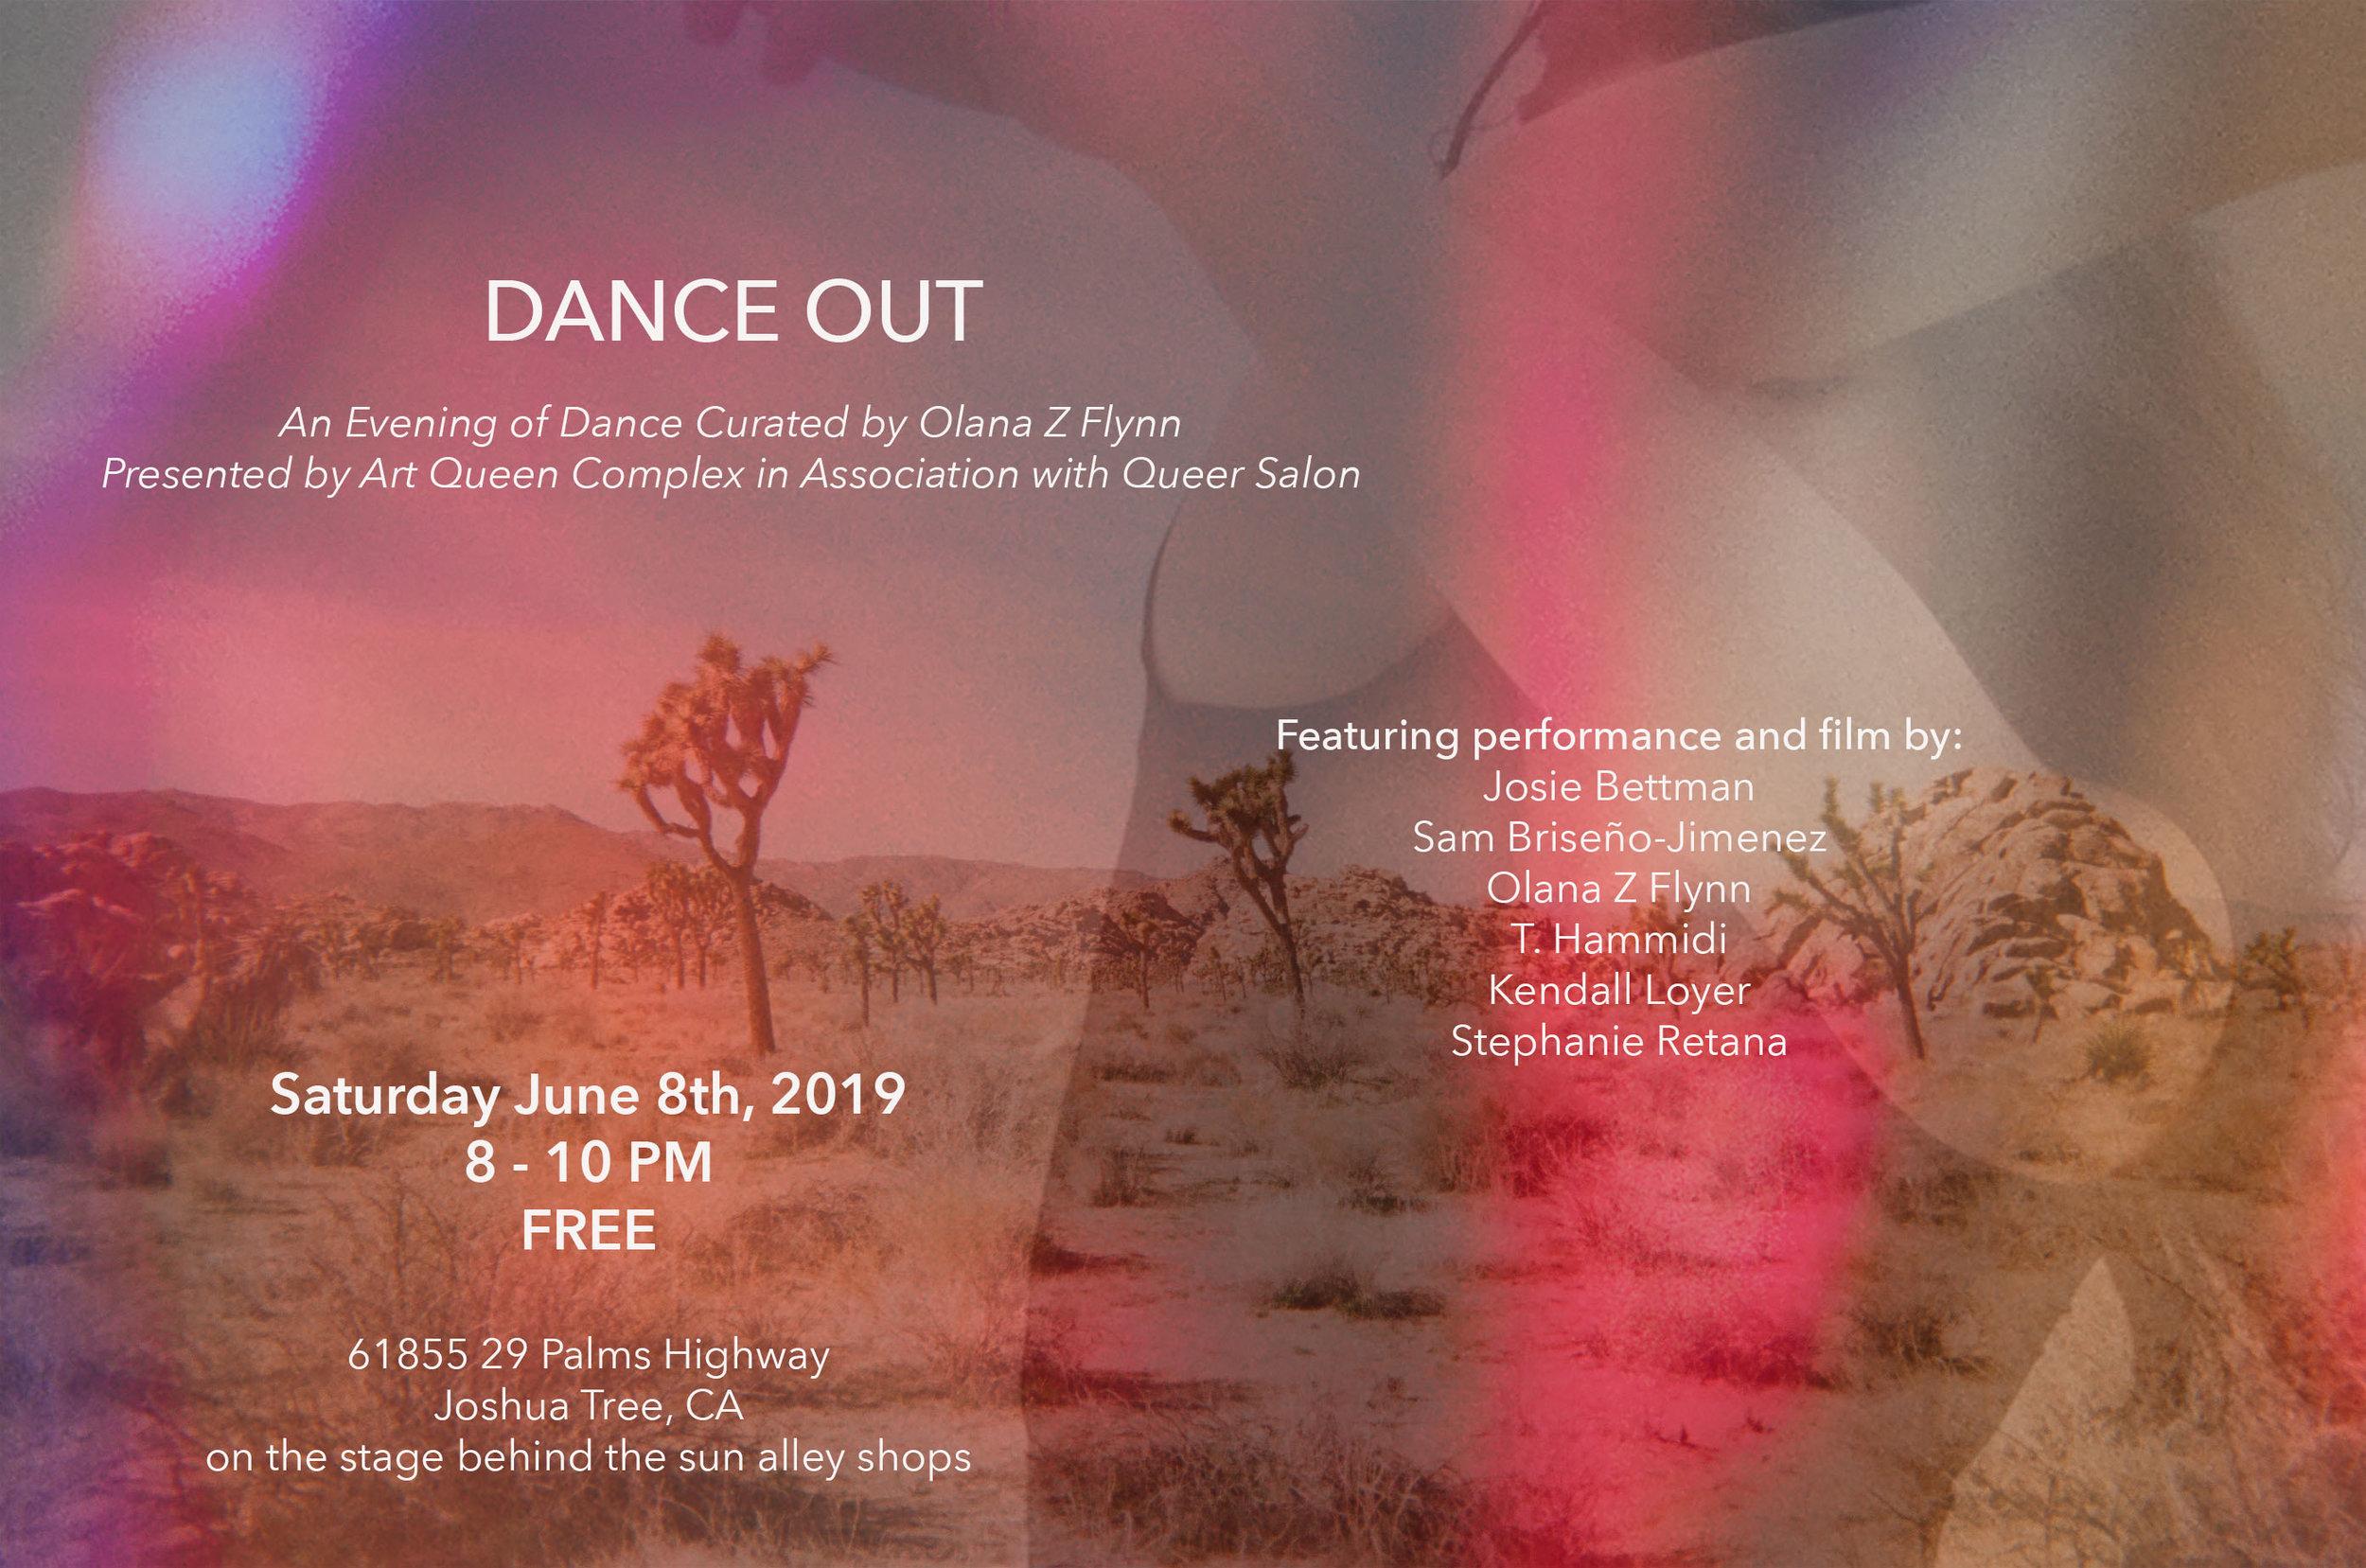 dance out flyer.jpg